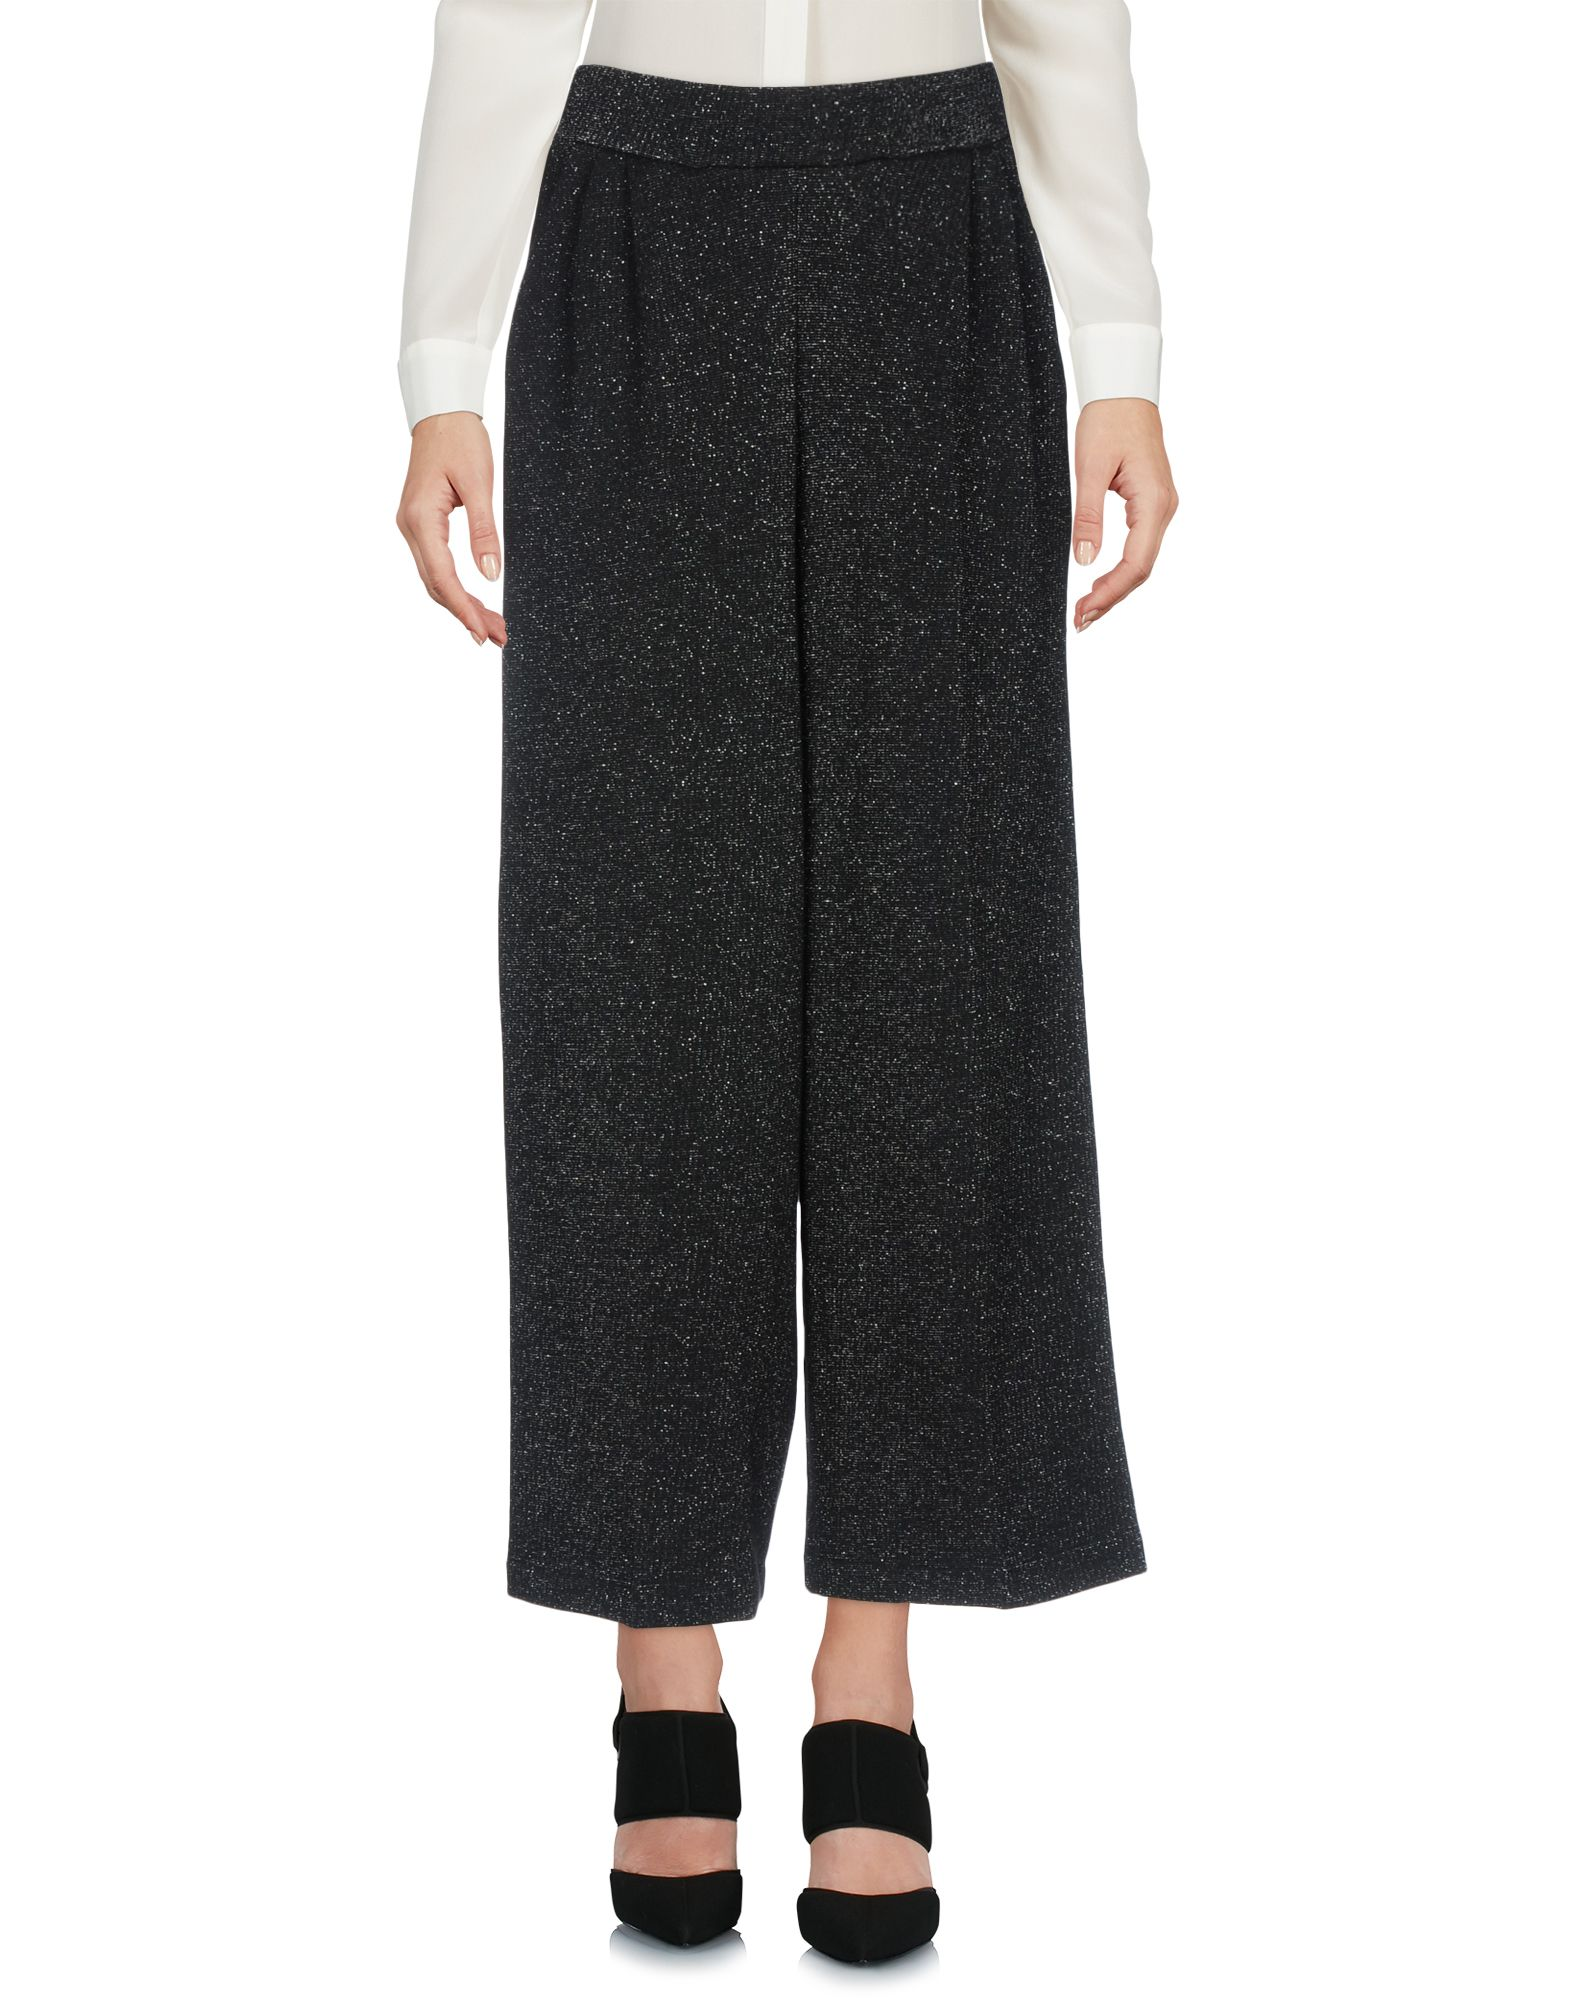 JIJIL Cropped Pants & Culottes in Black